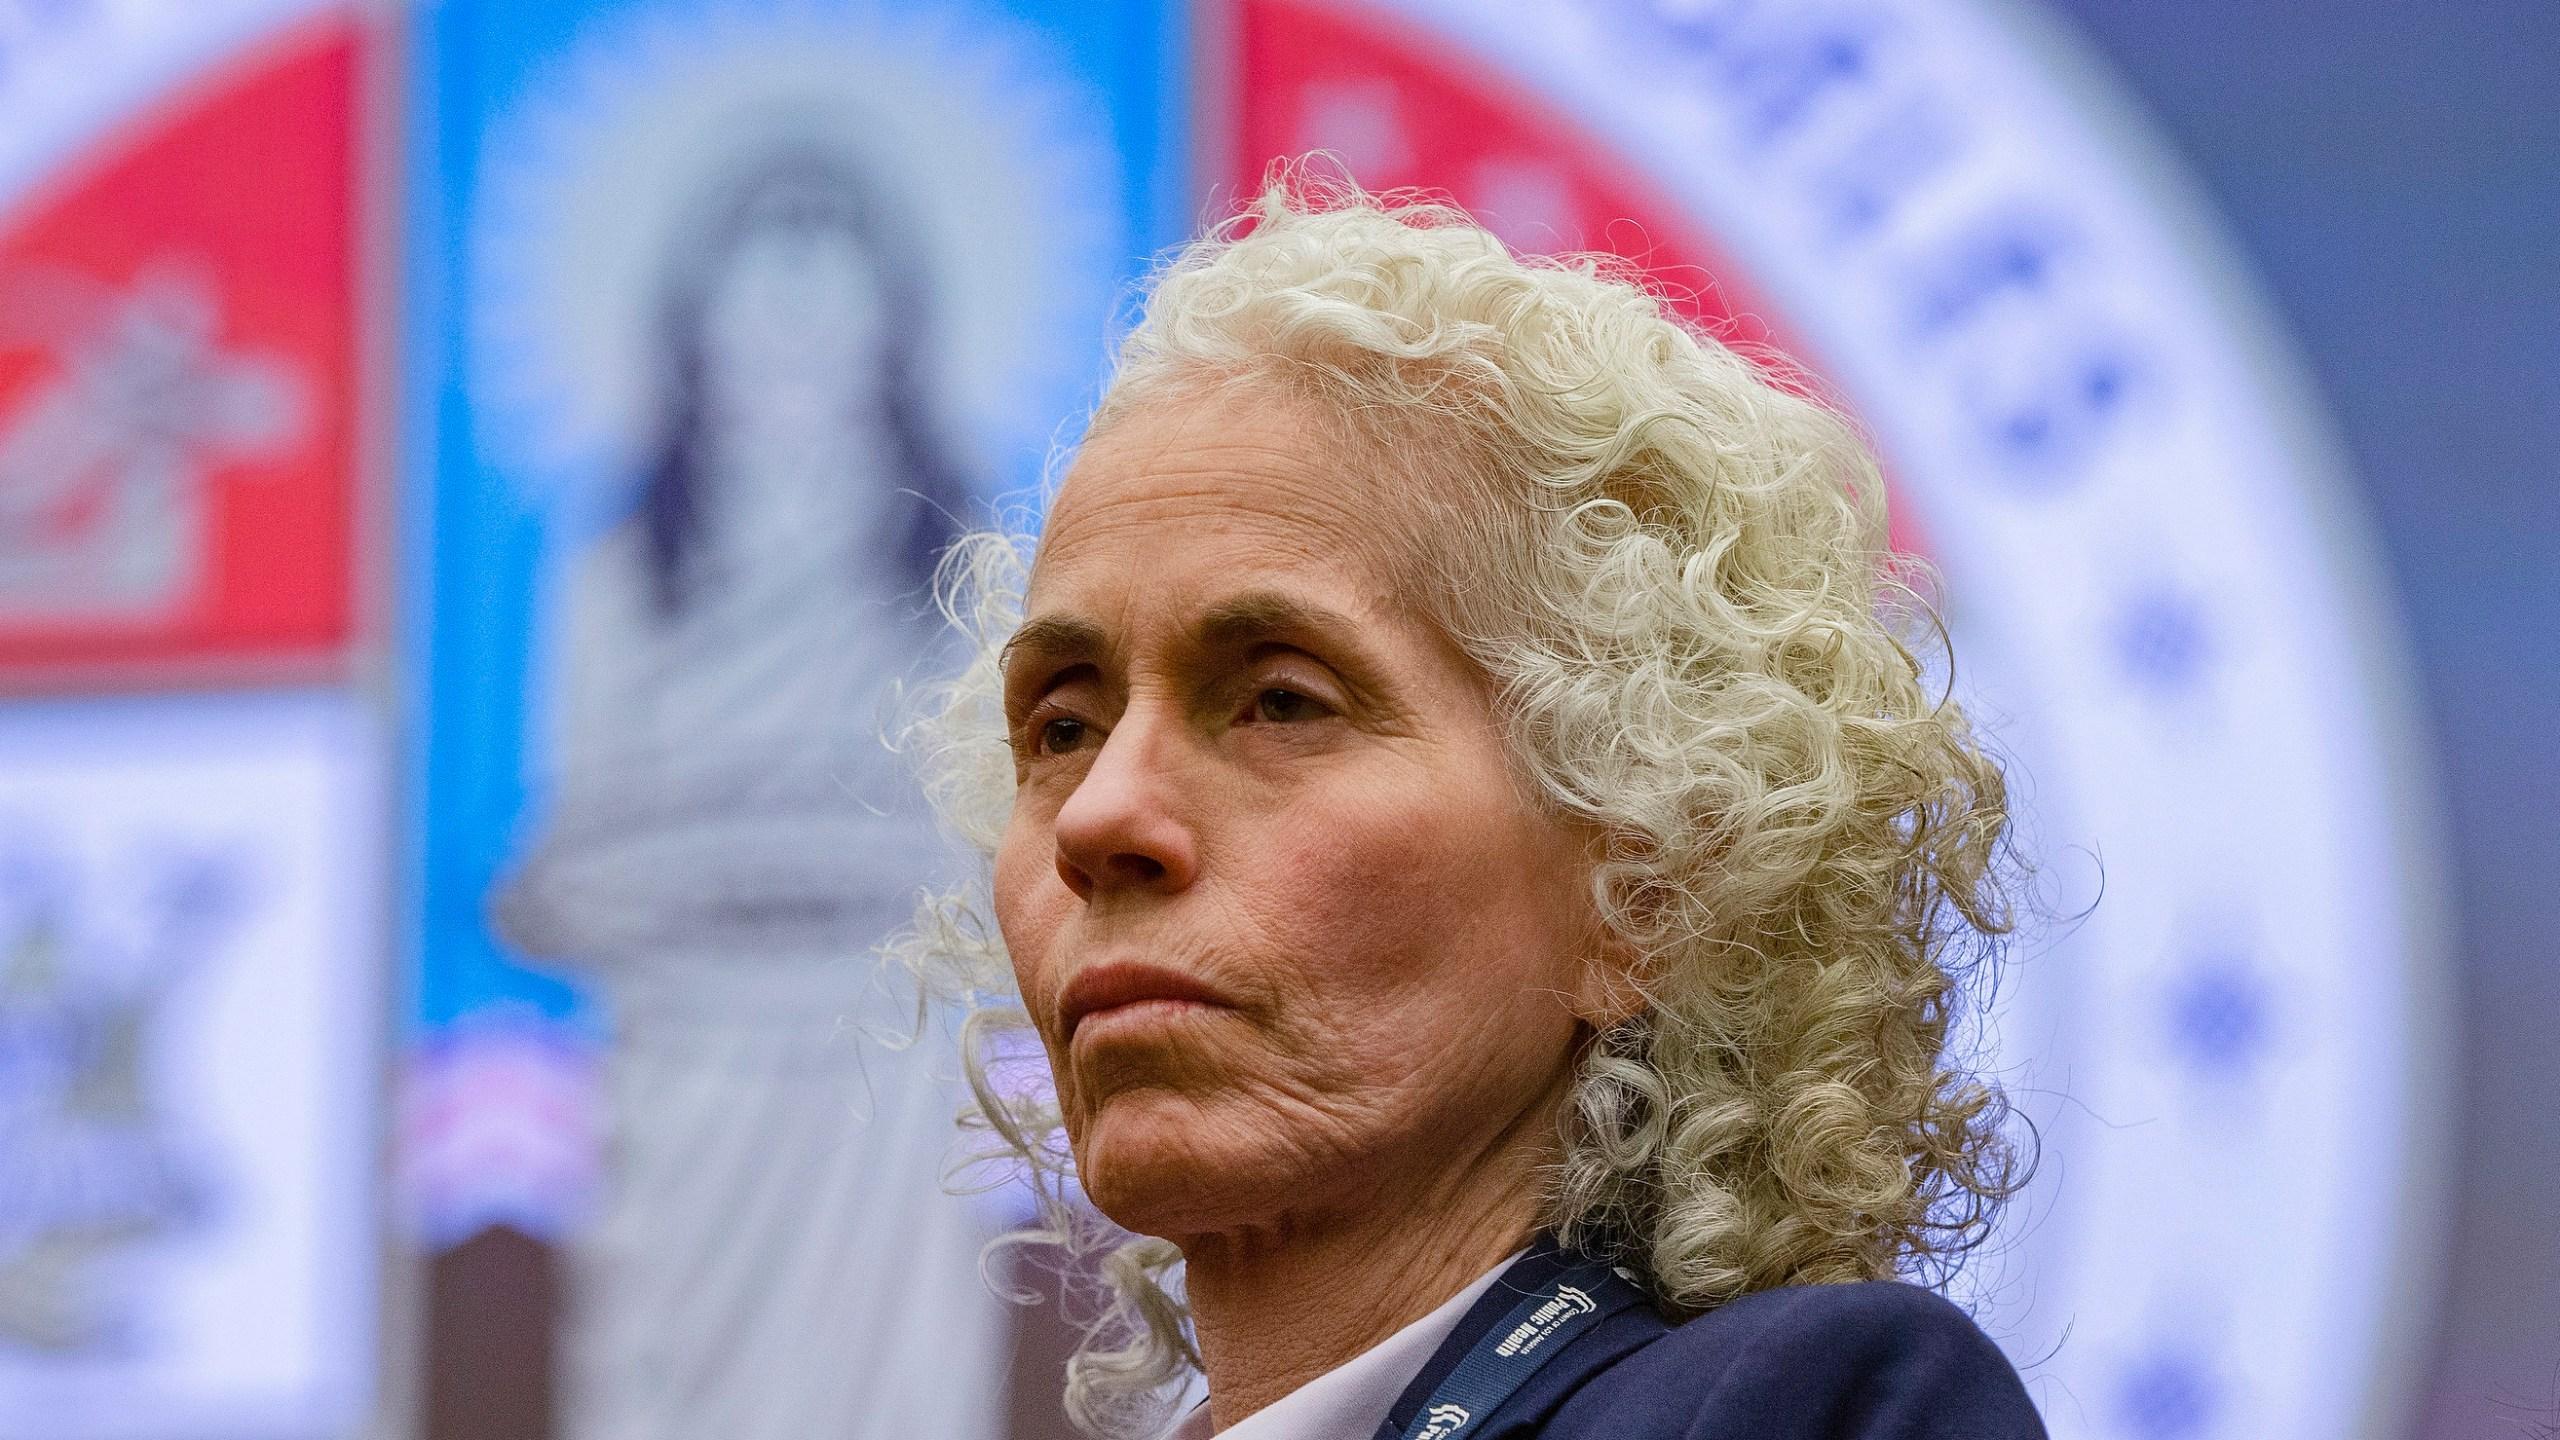 Barbara Ferrer